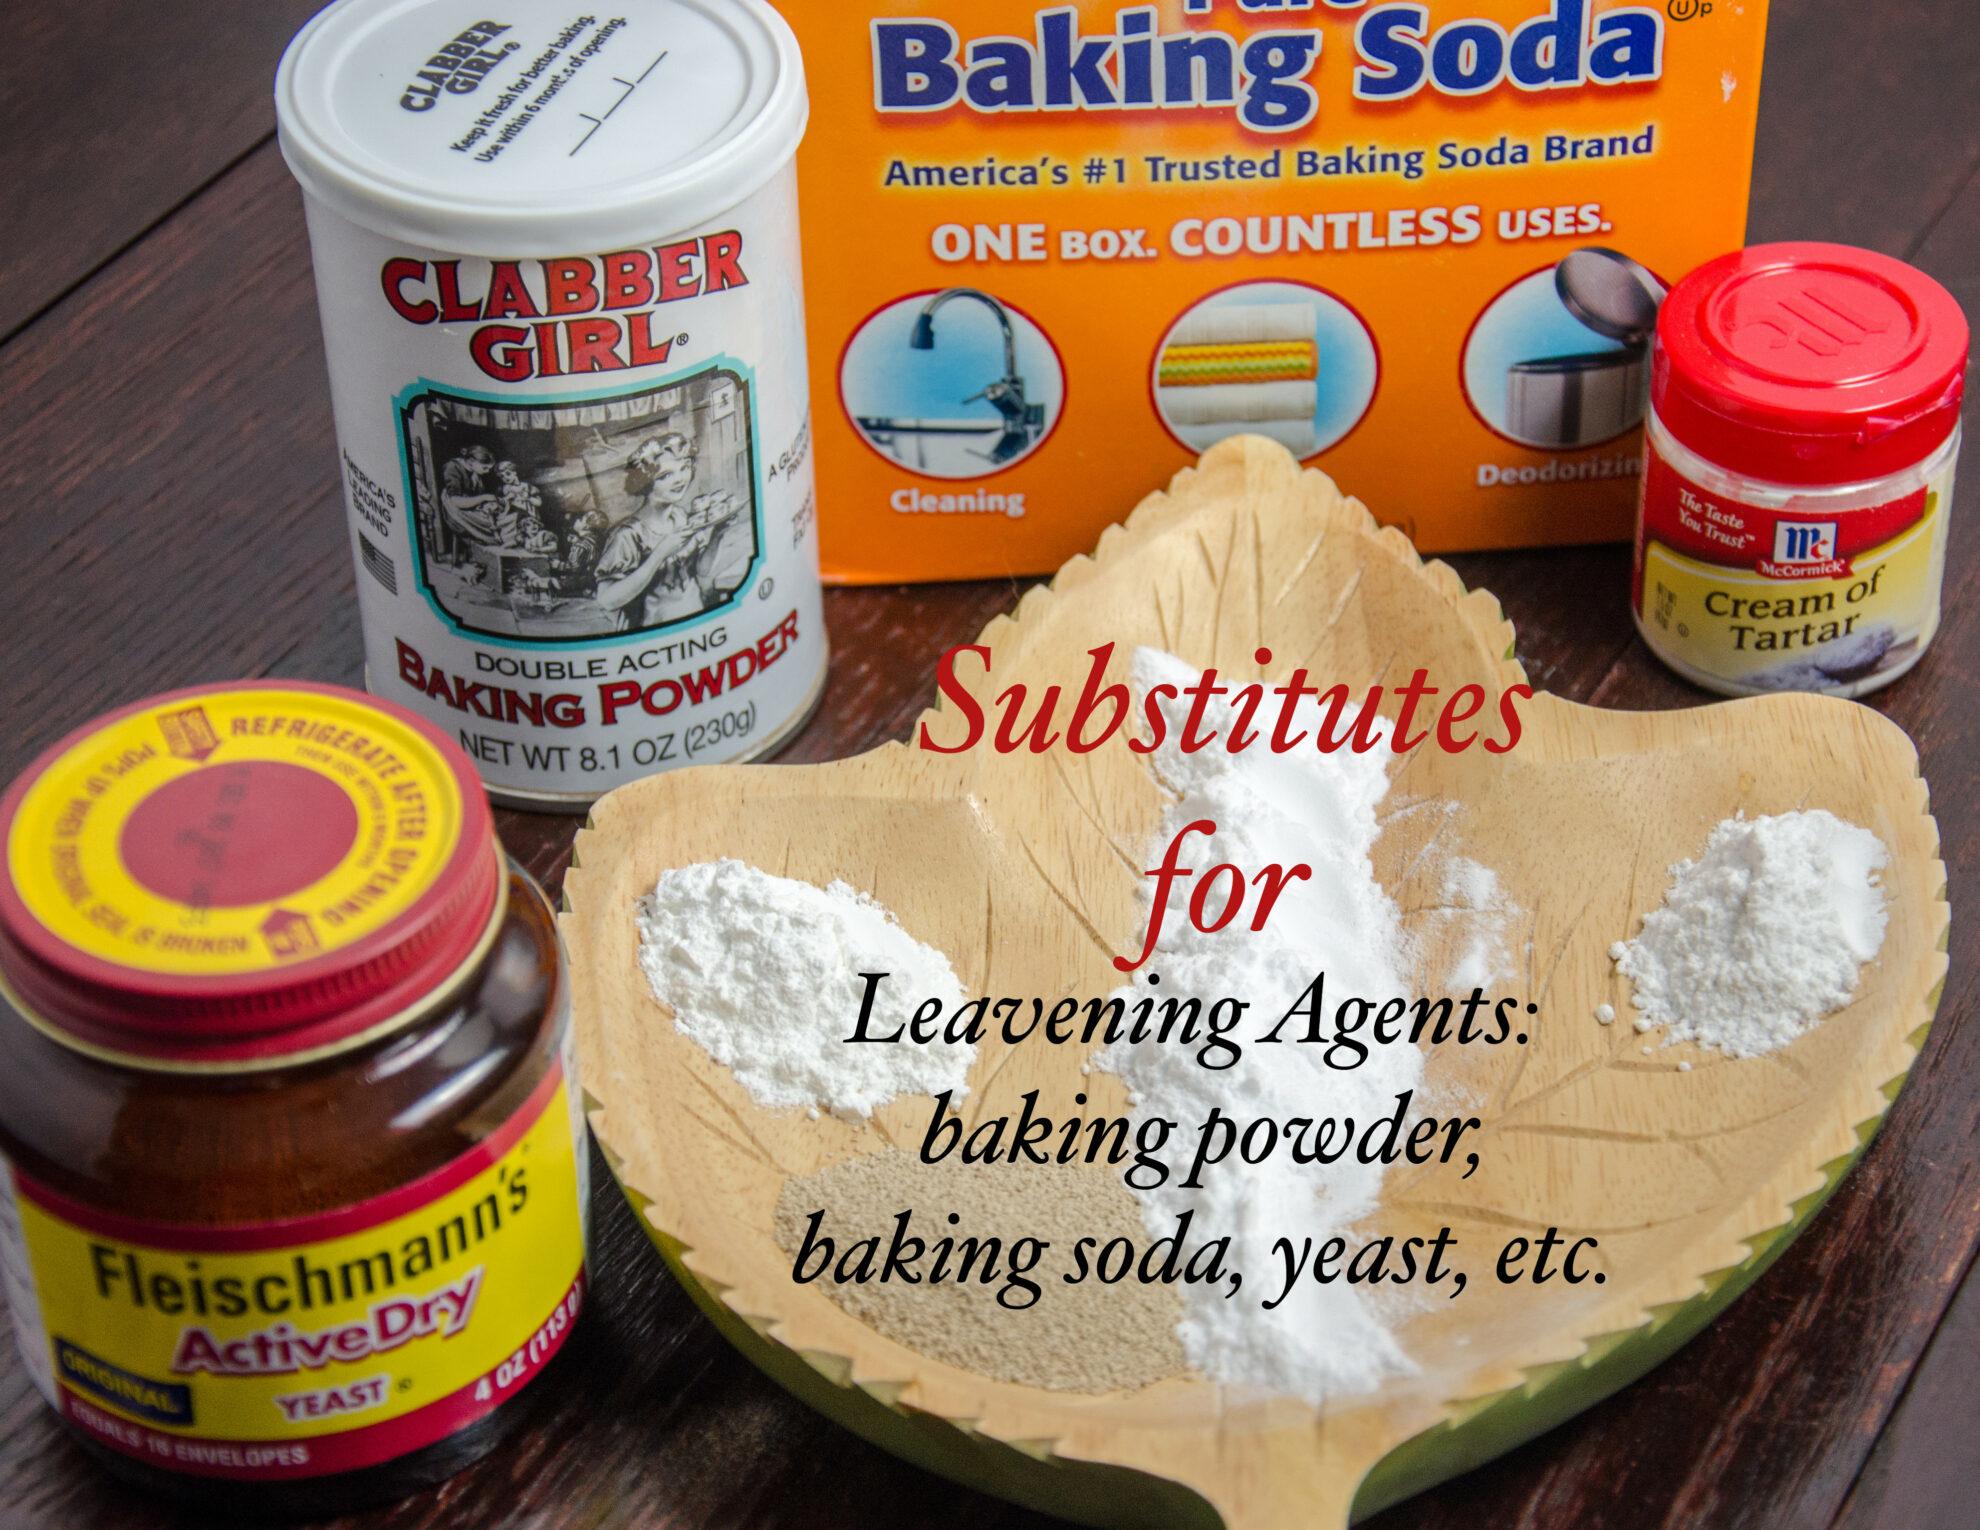 Substitutes for Leavening Agents: Baking Powder, Baking Soda, Yeast, etc.